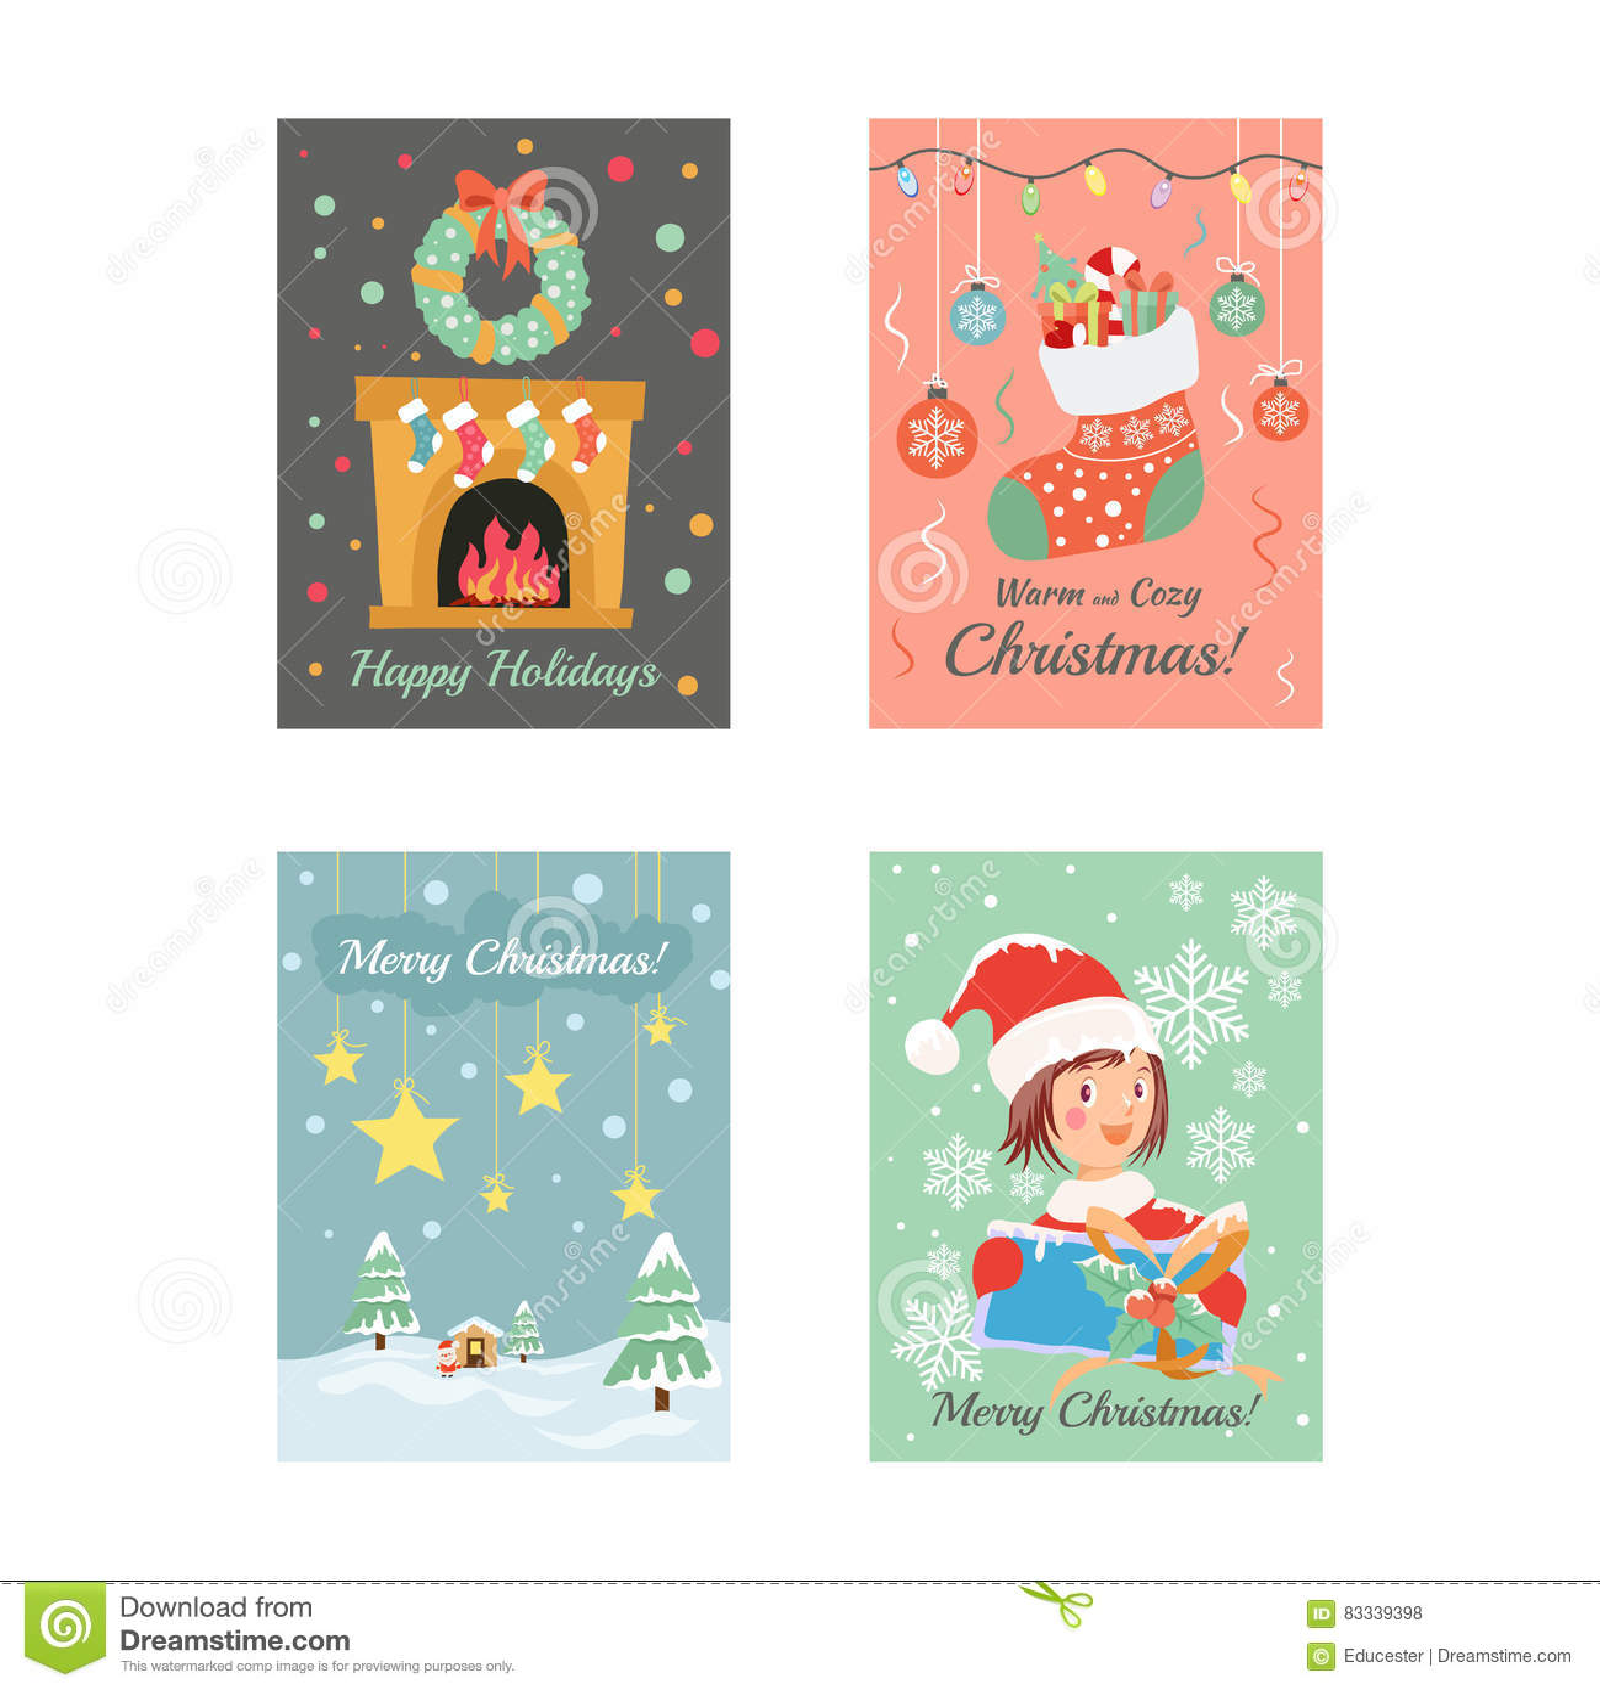 Christmas Cards 8 stock illustration. Illustration of greetings ...